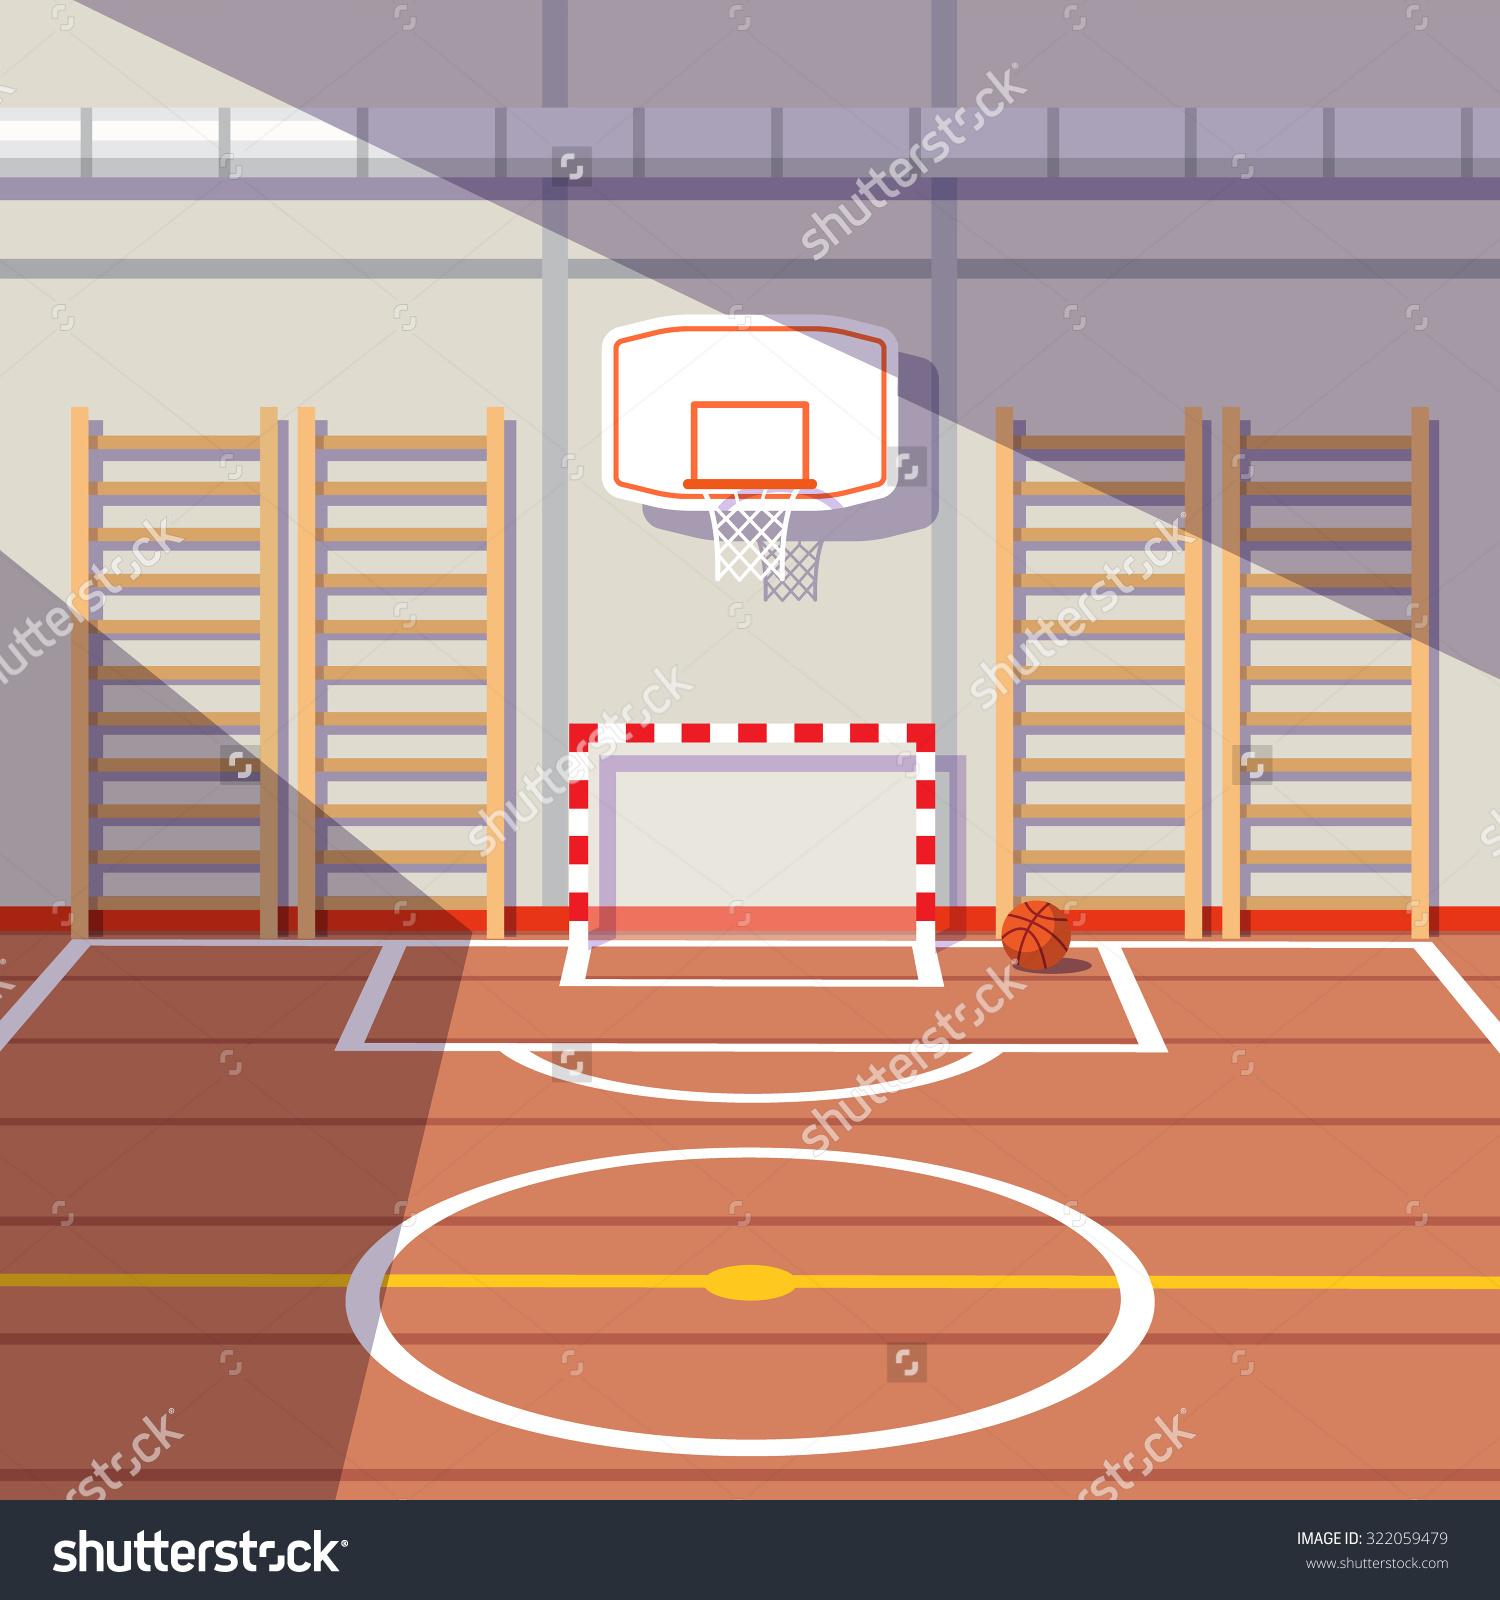 cartoon school gym clipart clipground basketball hoop clipart png basketball hoop clip art torn photoshop